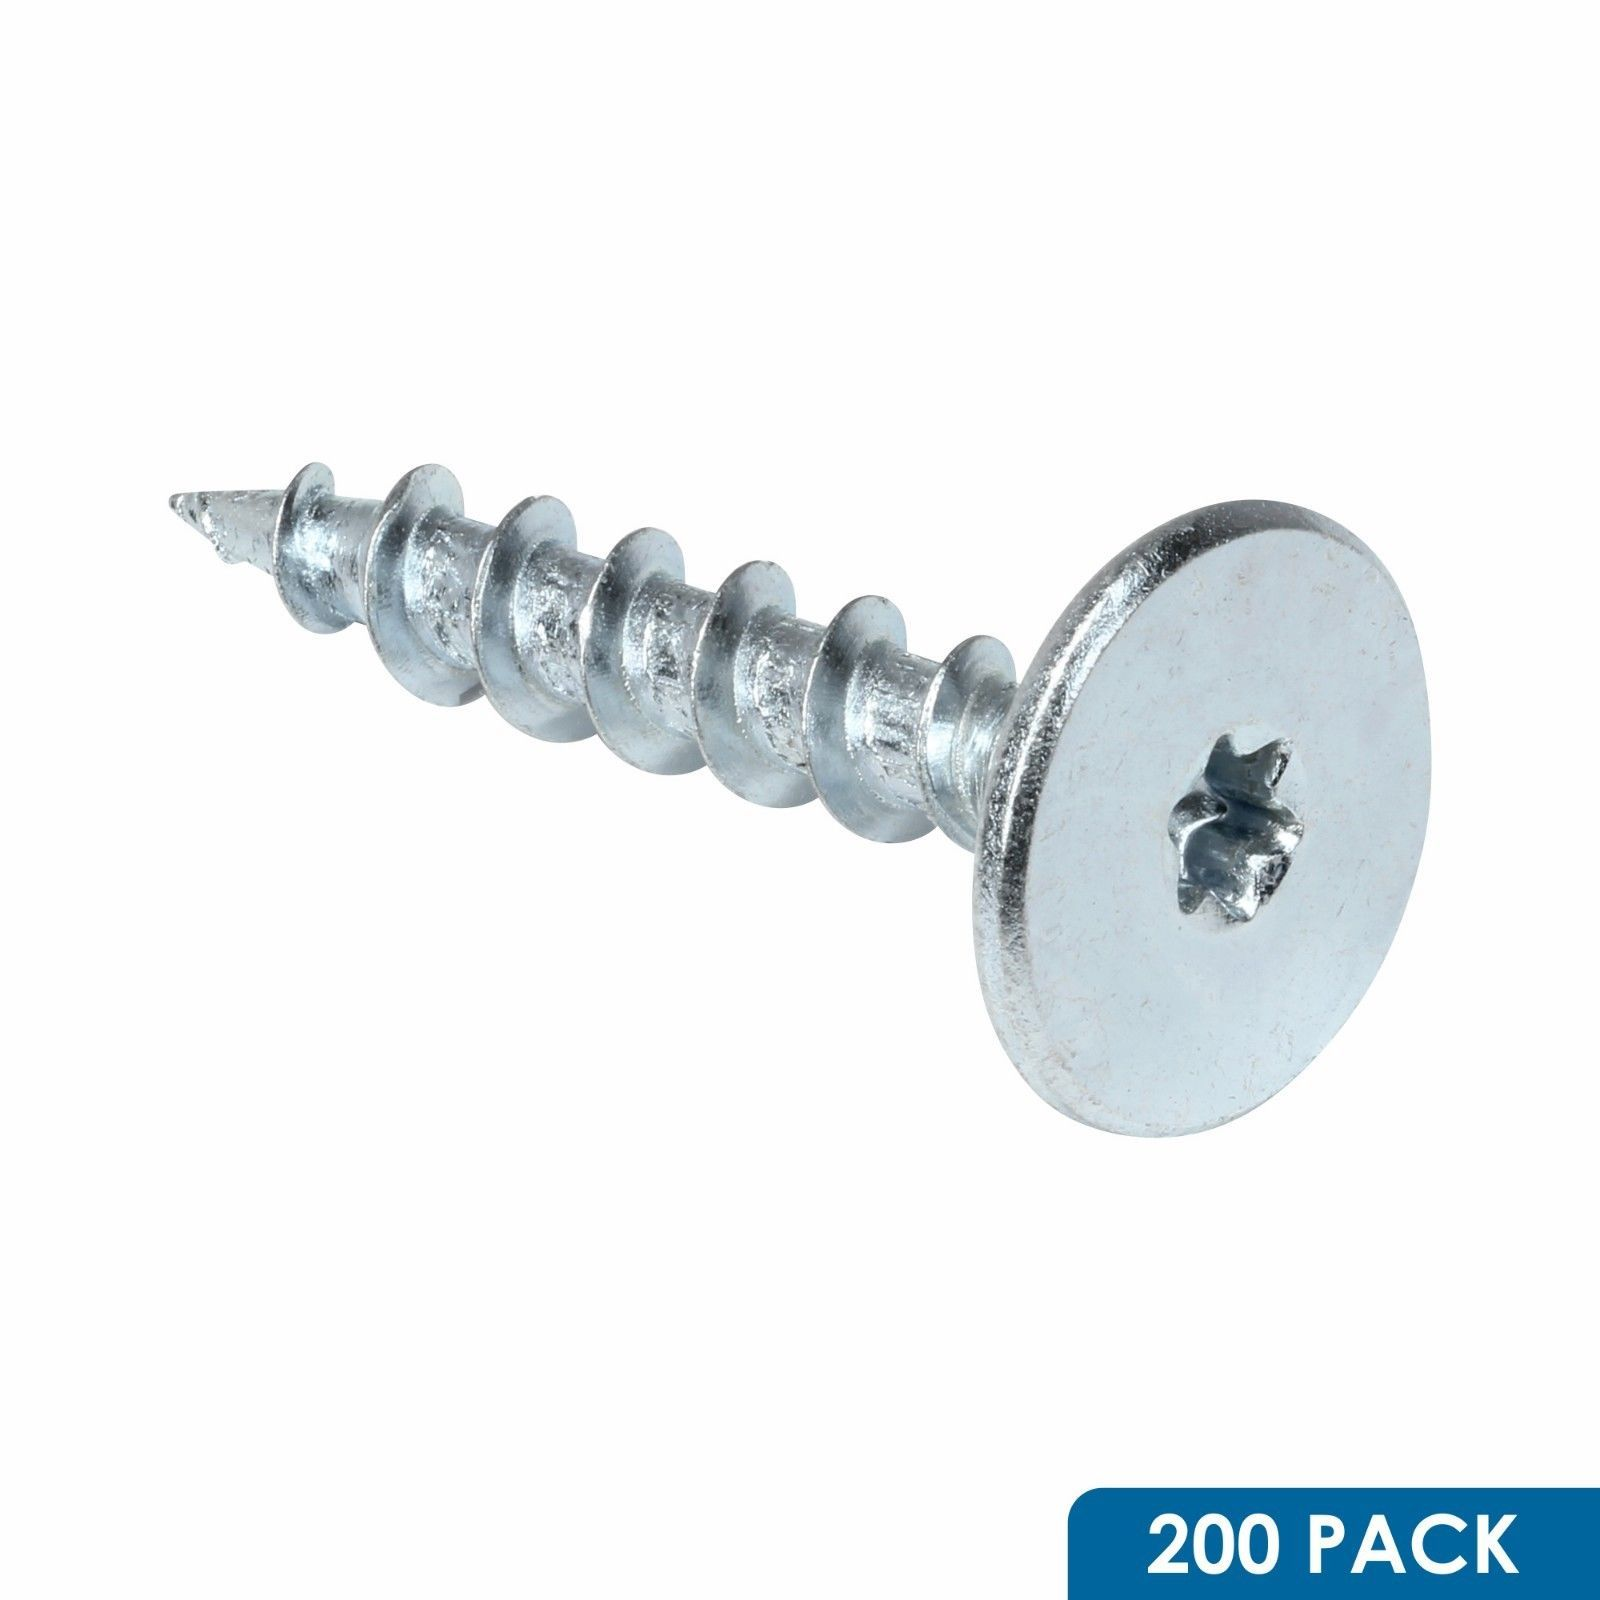 Powerhead Screws For Wood 200 Pcs Fastcap T20020 1 1 434 Uses T20 Torx Drive Bits Type 17 Point Tip Easily Self Drills Into Studs Ebay Screws Diy Shelves